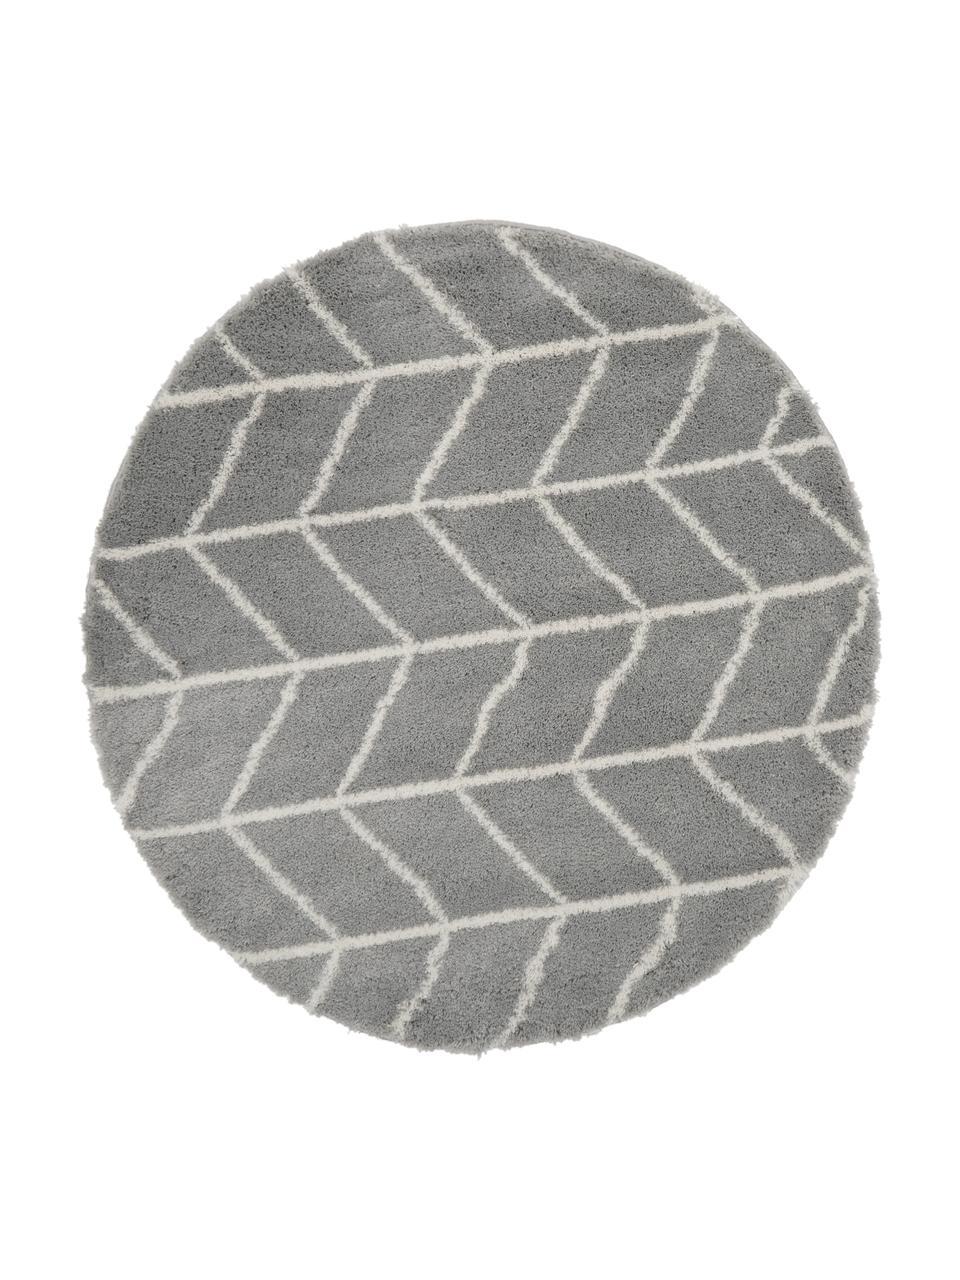 Tappeto soffice a pelo lungo grigio/bianco crema Cera, Retro: 78% juta, 14% cotone, 8% , Grigio, bianco crema, Ø 150 cm (taglia M)